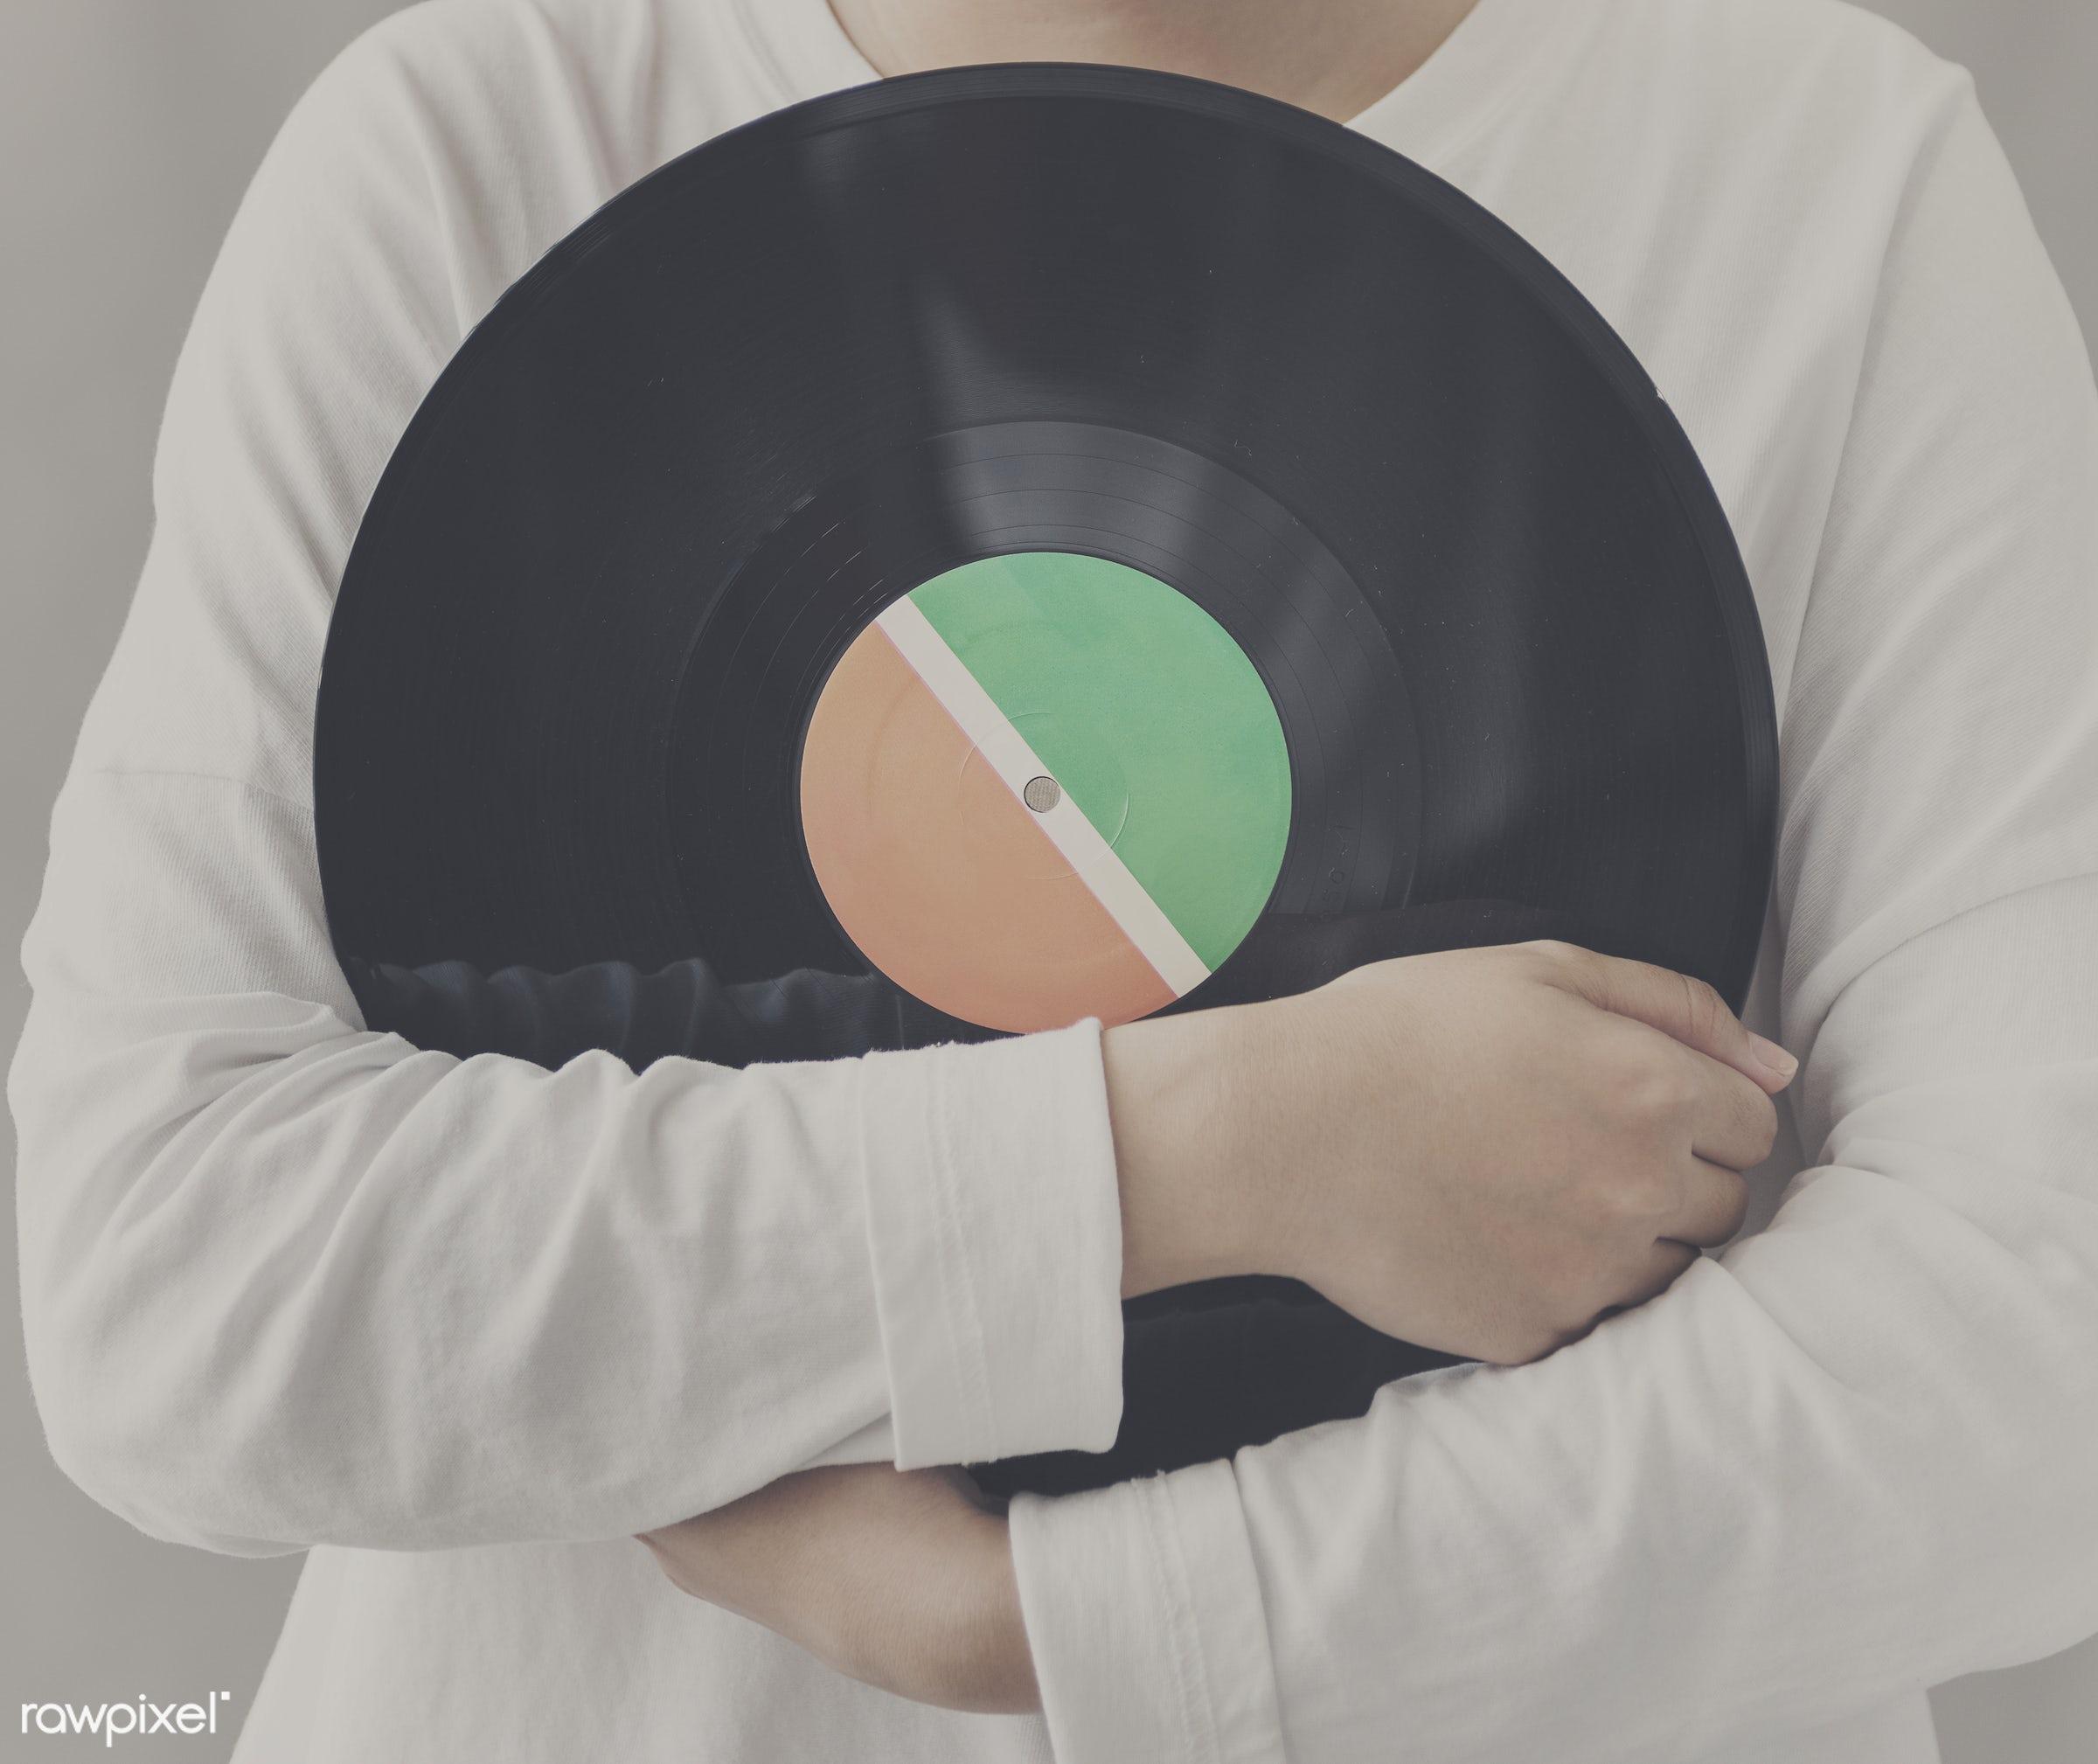 album, analog, audio, chord, classic, cool, disc, disk, enjoying, grunge, grungy, instrument, jockey, jukebox, listen,...